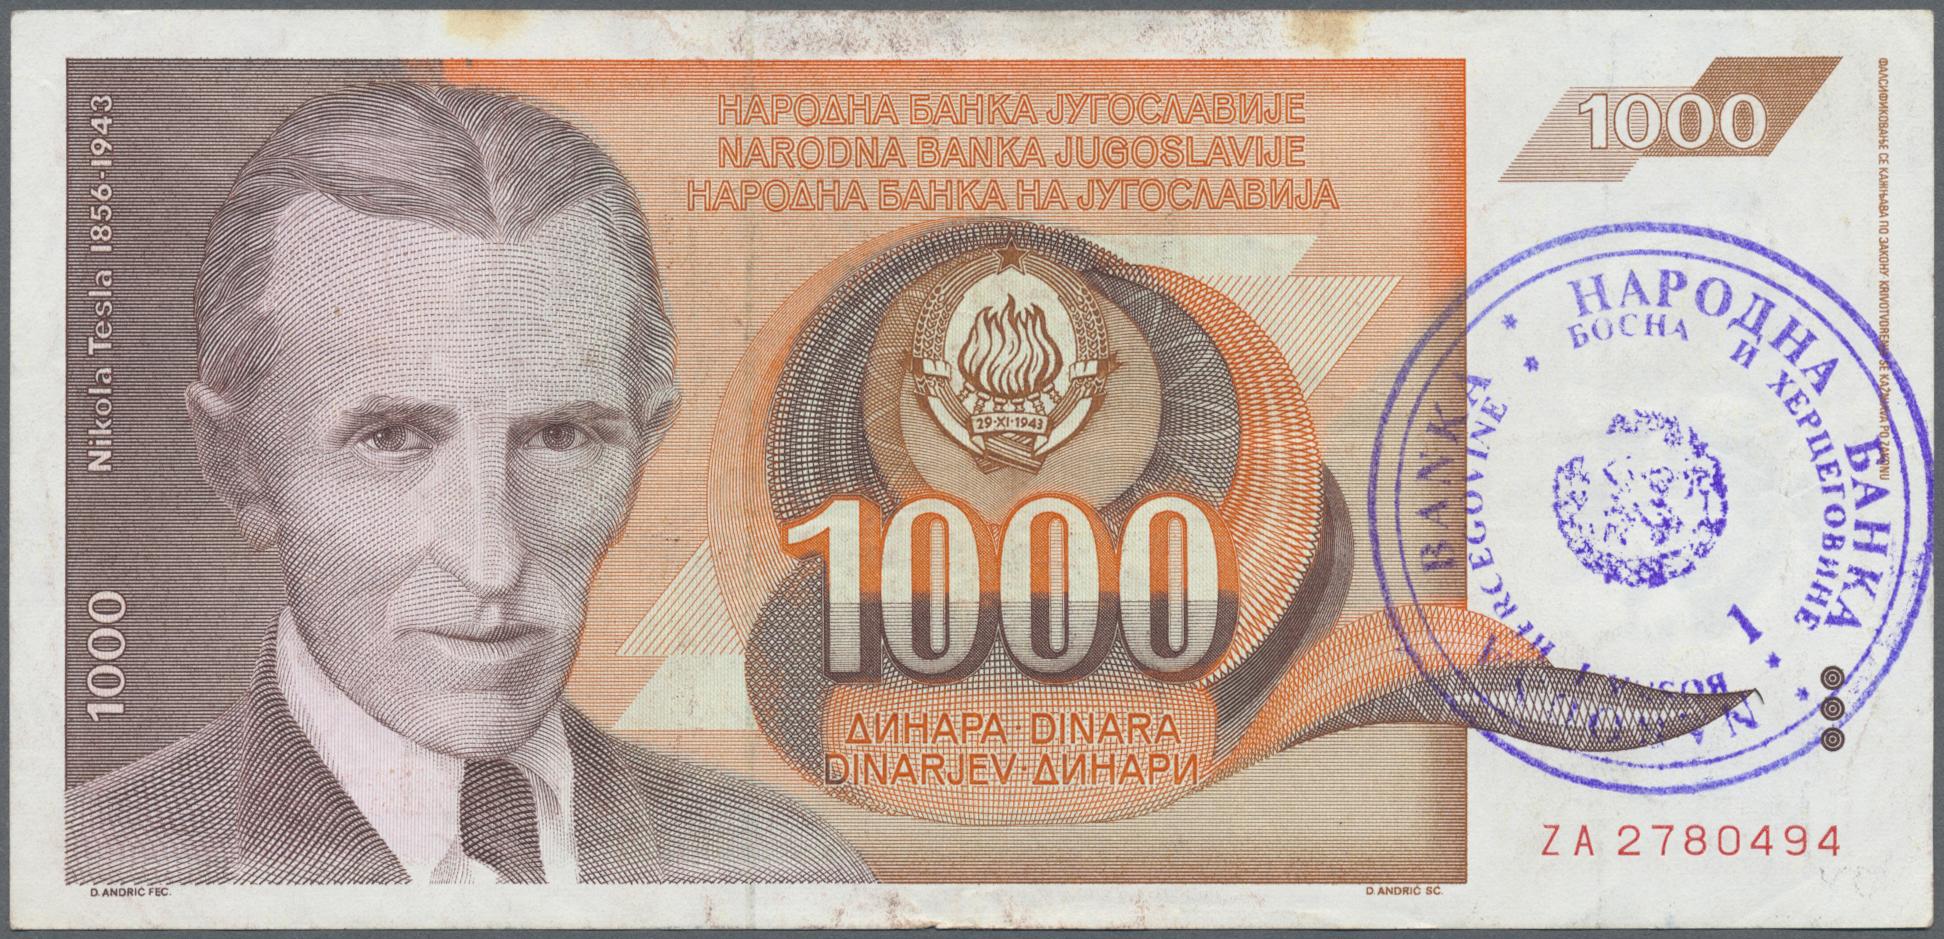 Lot 00360 - Bosnia & Herzegovina / Bosnien & Herzegovina   Banknoten  -  Auktionshaus Christoph Gärtner GmbH & Co. KG 51th Auction - Day 1